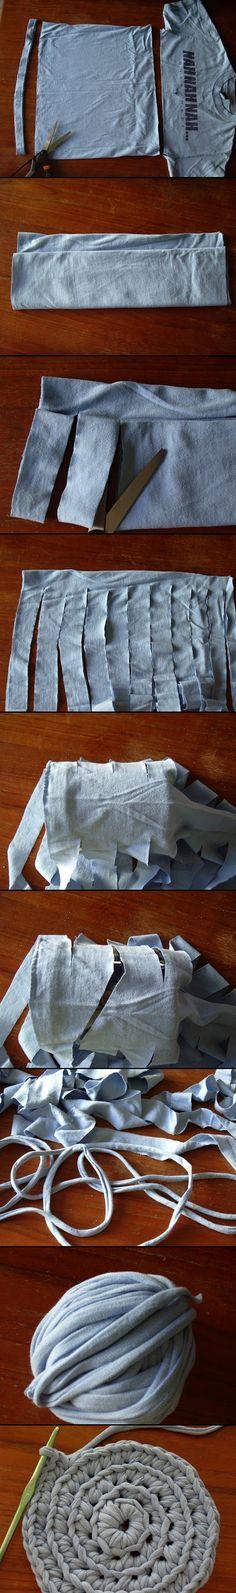 T-Shirt Wolle häckeln